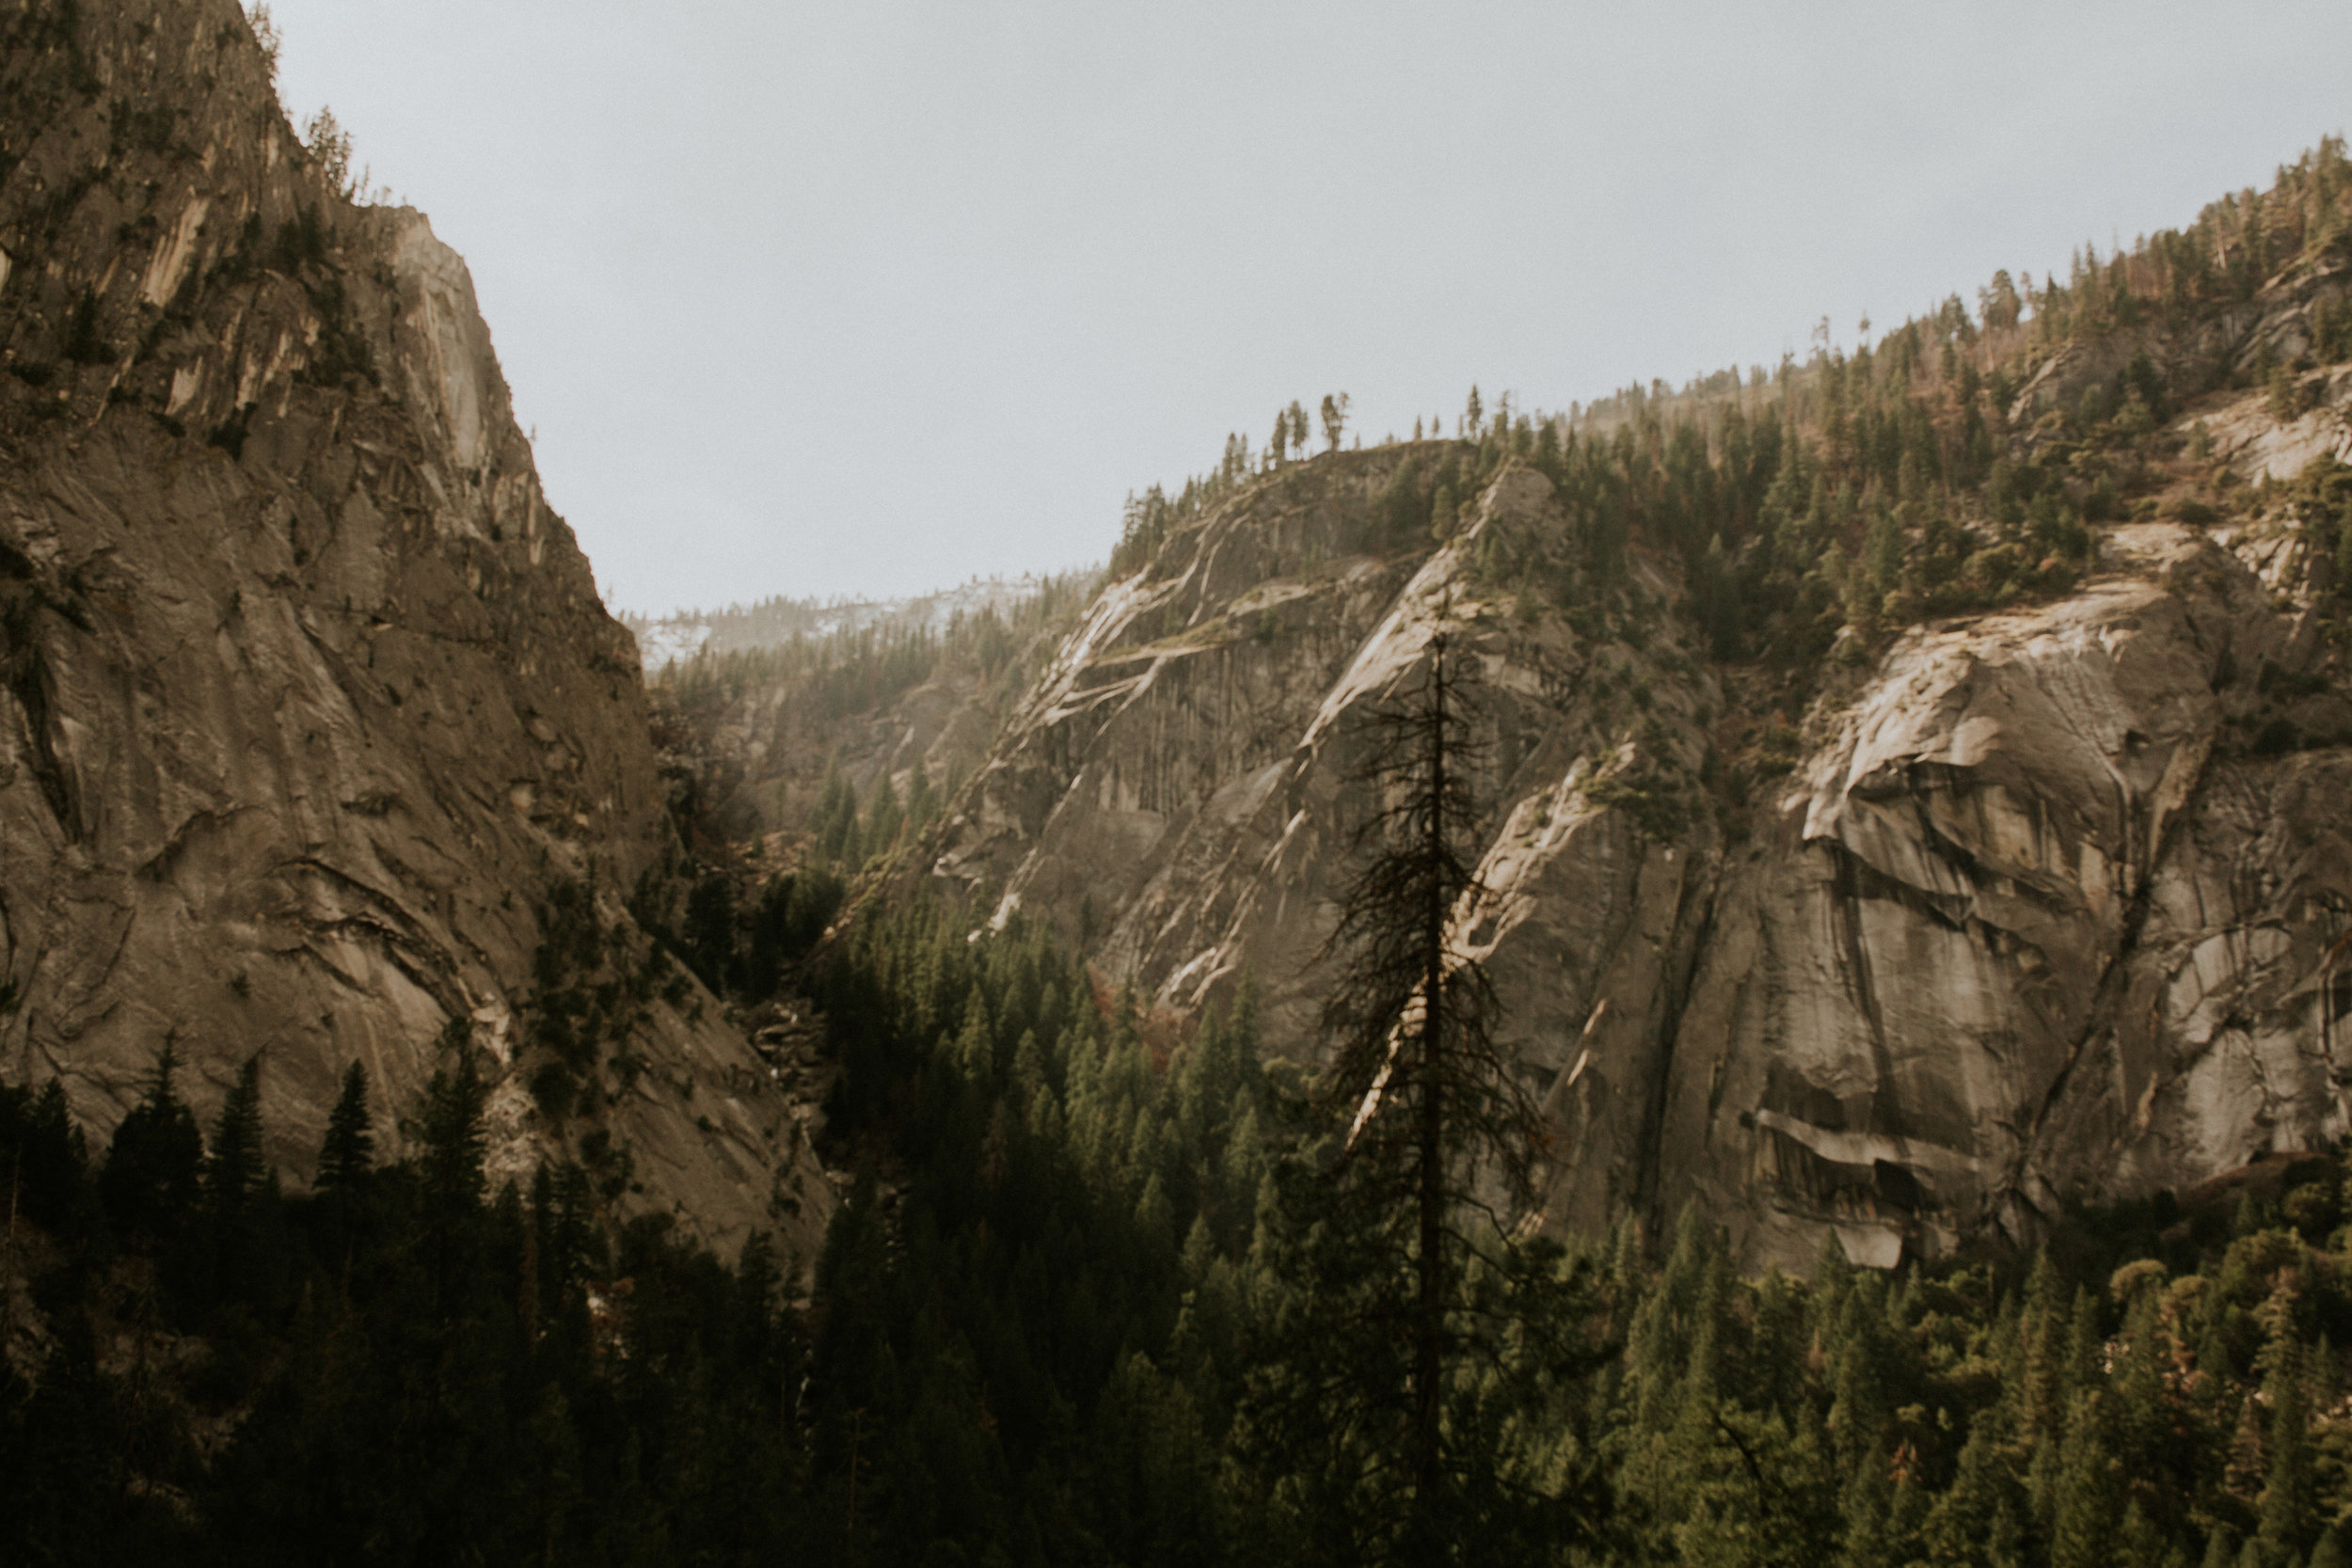 yosemite valley mist trail to vernal falls wedding adventure elopement photographer BreeAnna Lasher